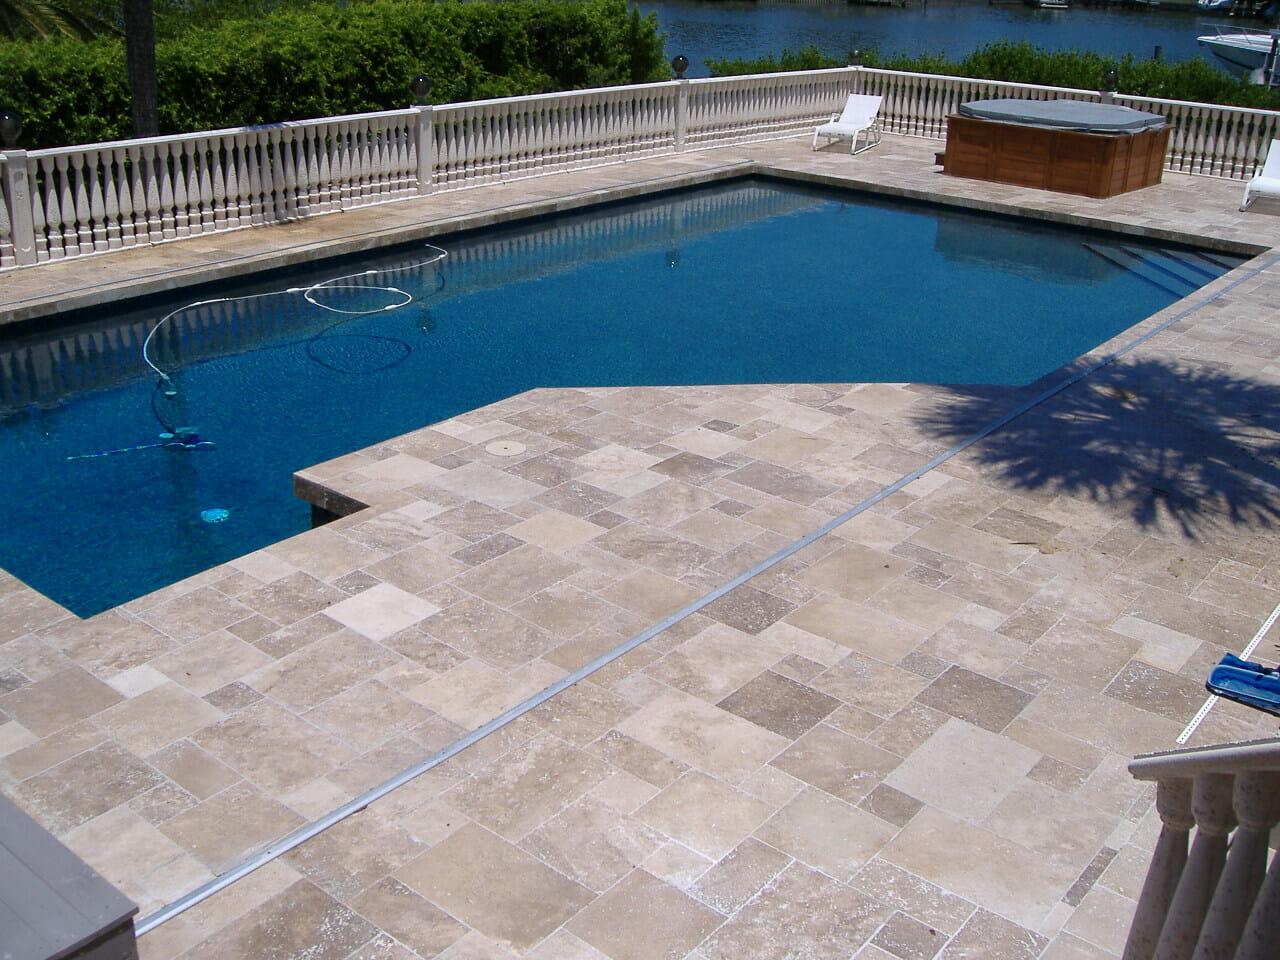 Pool Coping tiles travertine